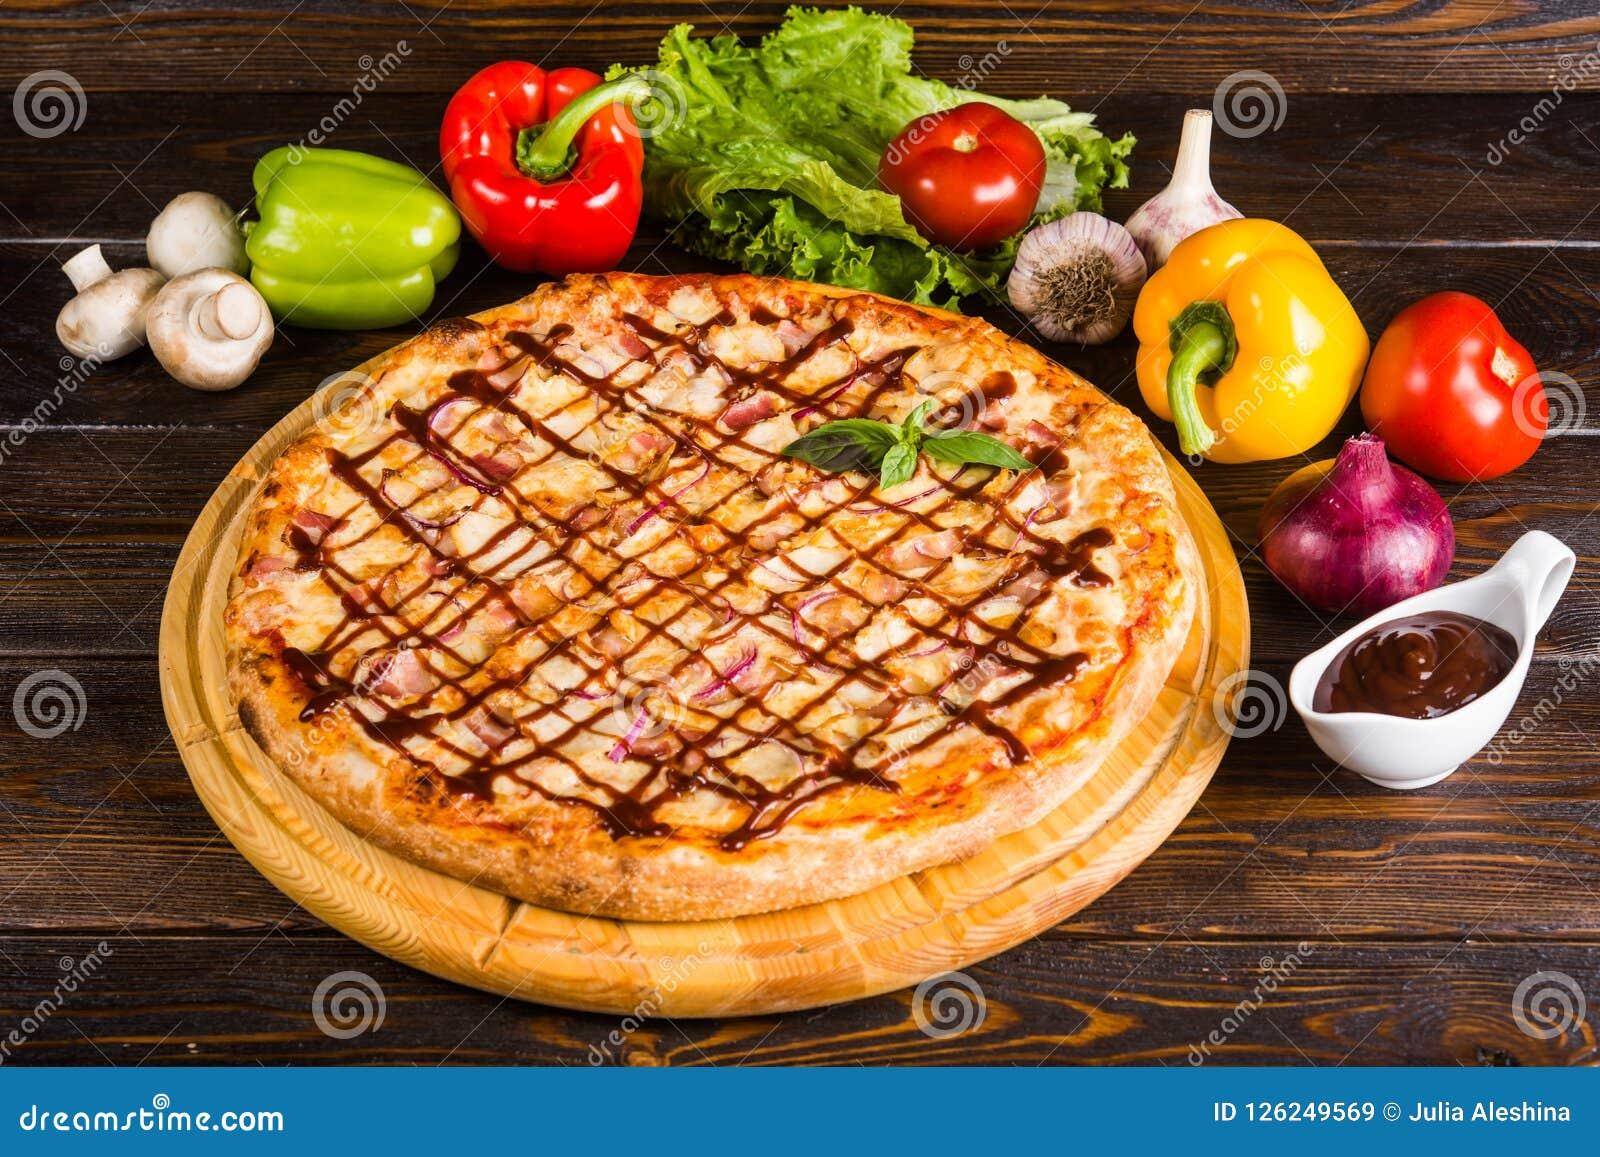 Pizza met ui, bacon en barbecuesaus